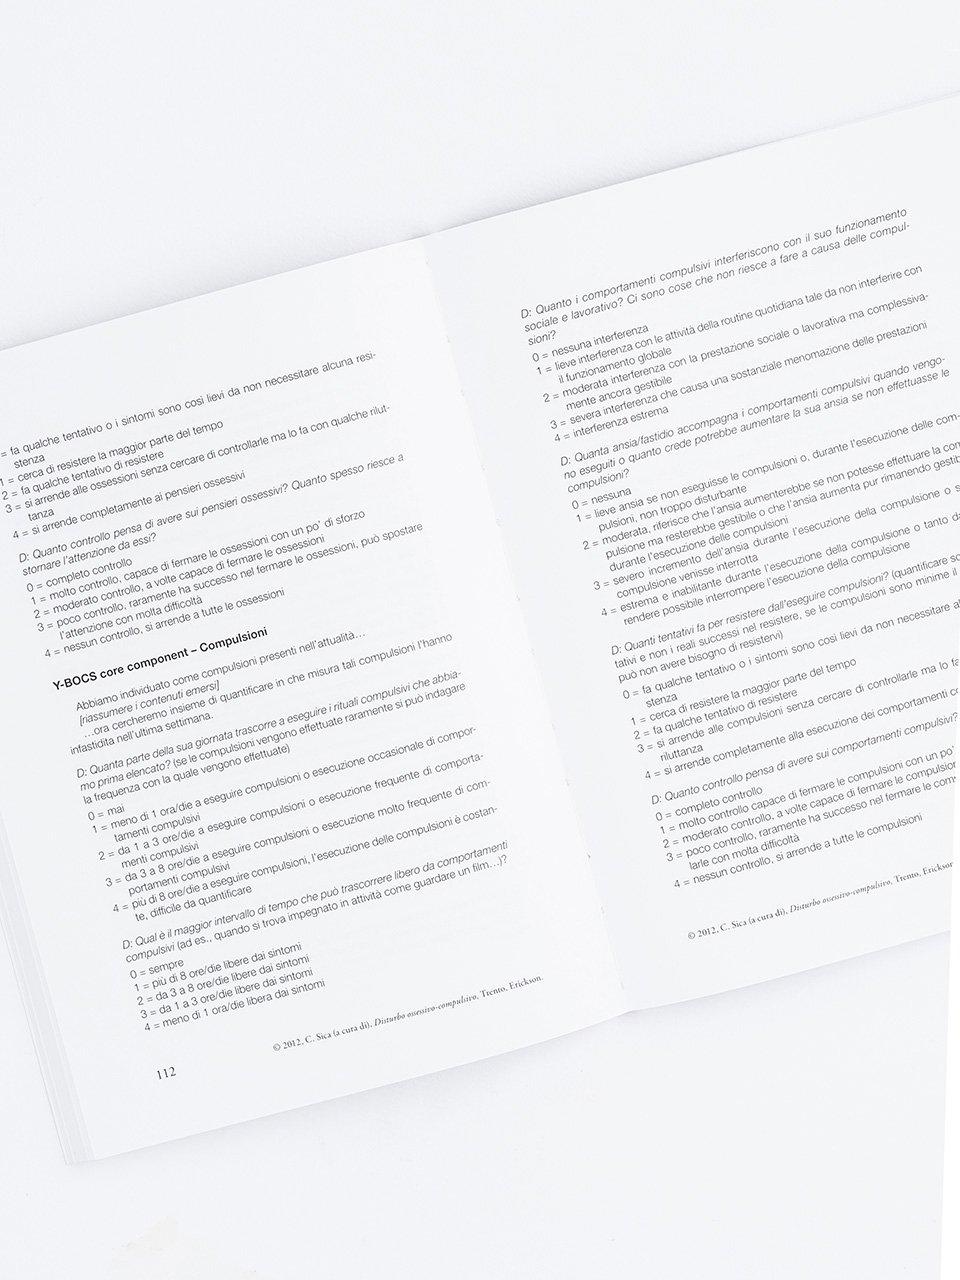 Disturbo ossessivo compulsivo - Libri - Erickson 2